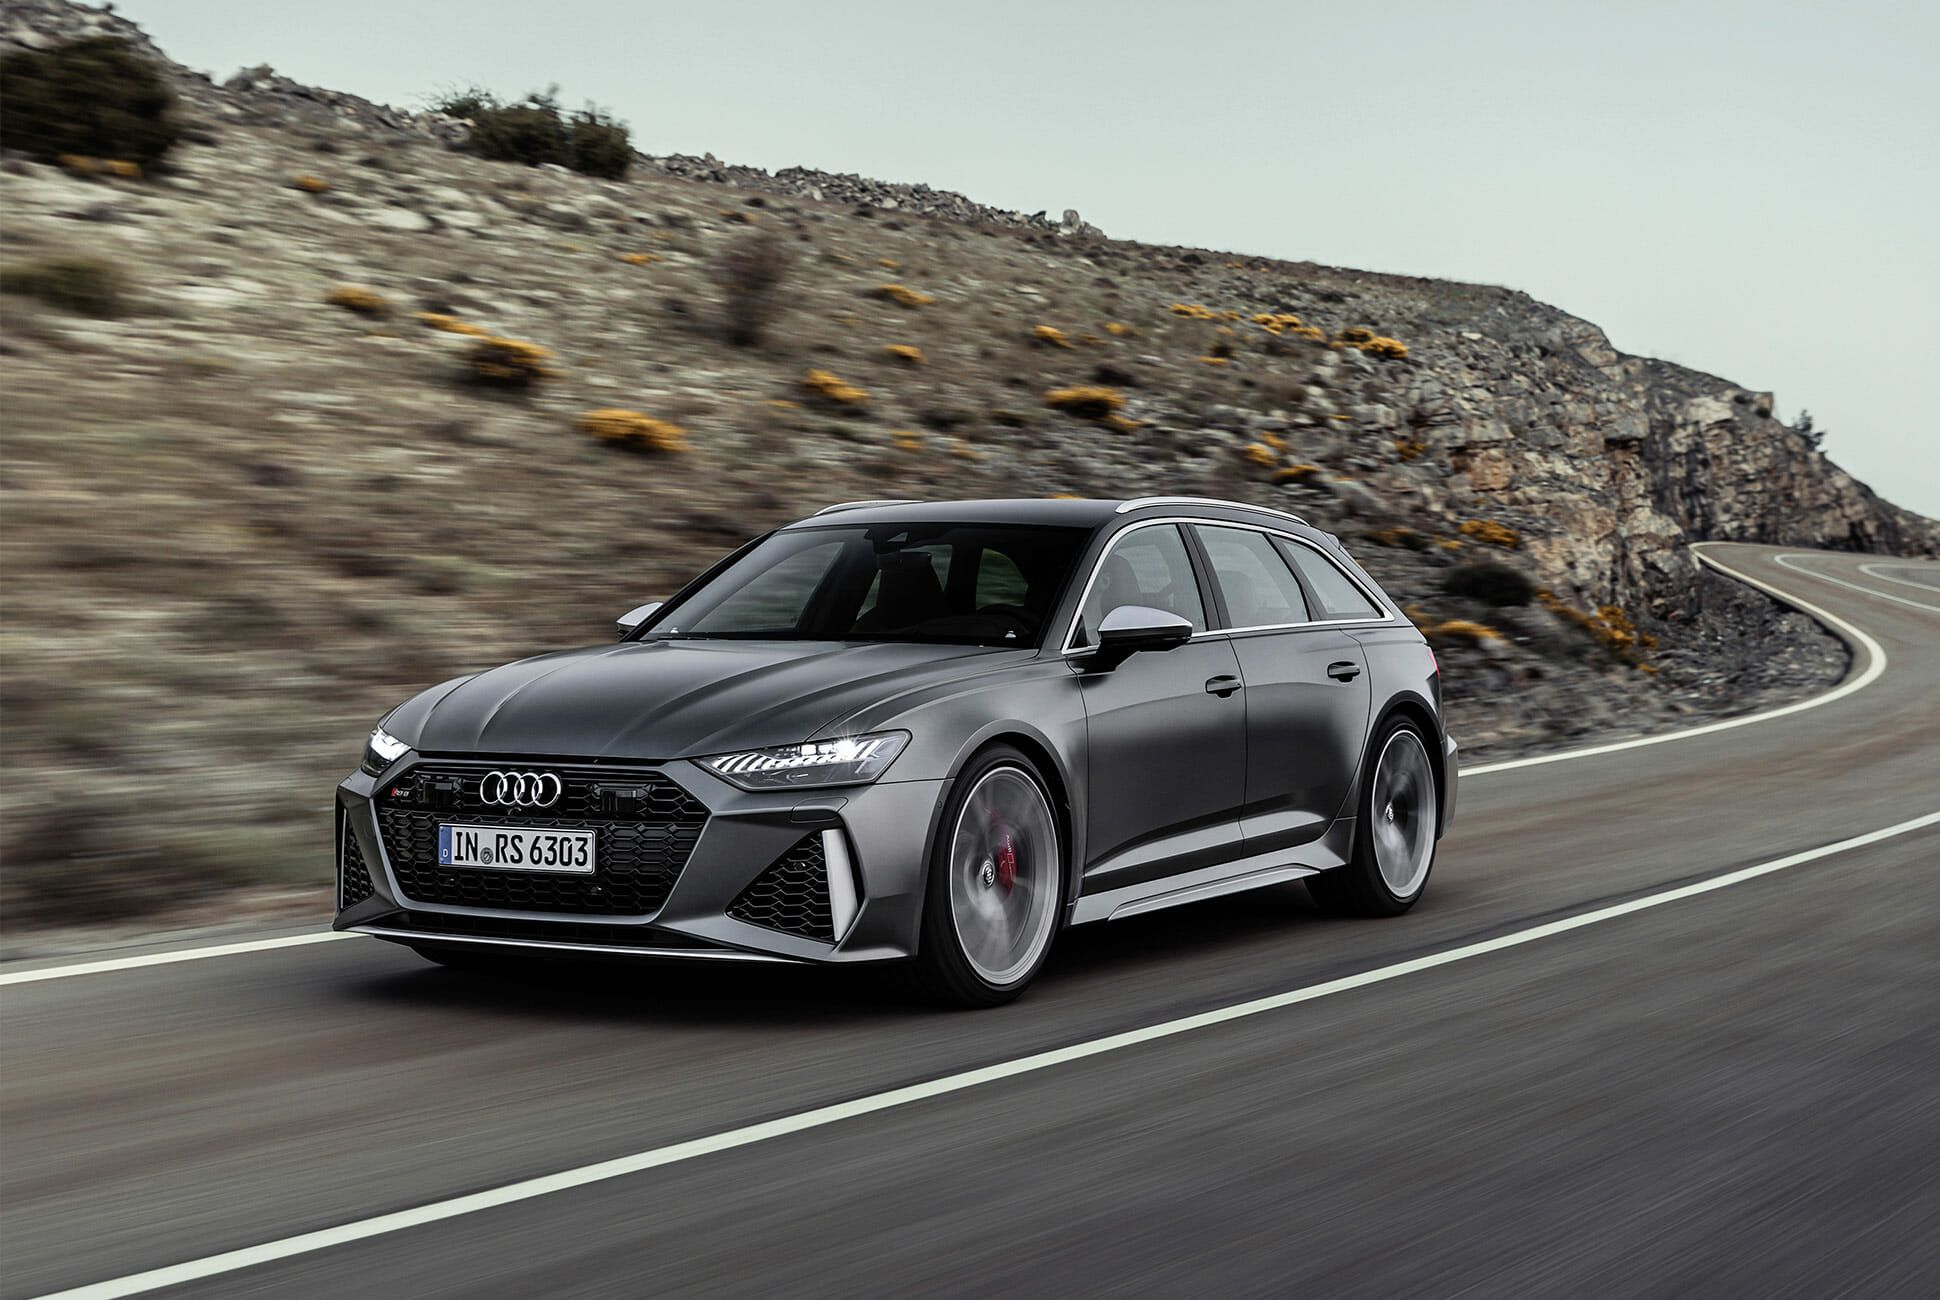 Audi-RS6-Wagon-gear-patrol-slide-7